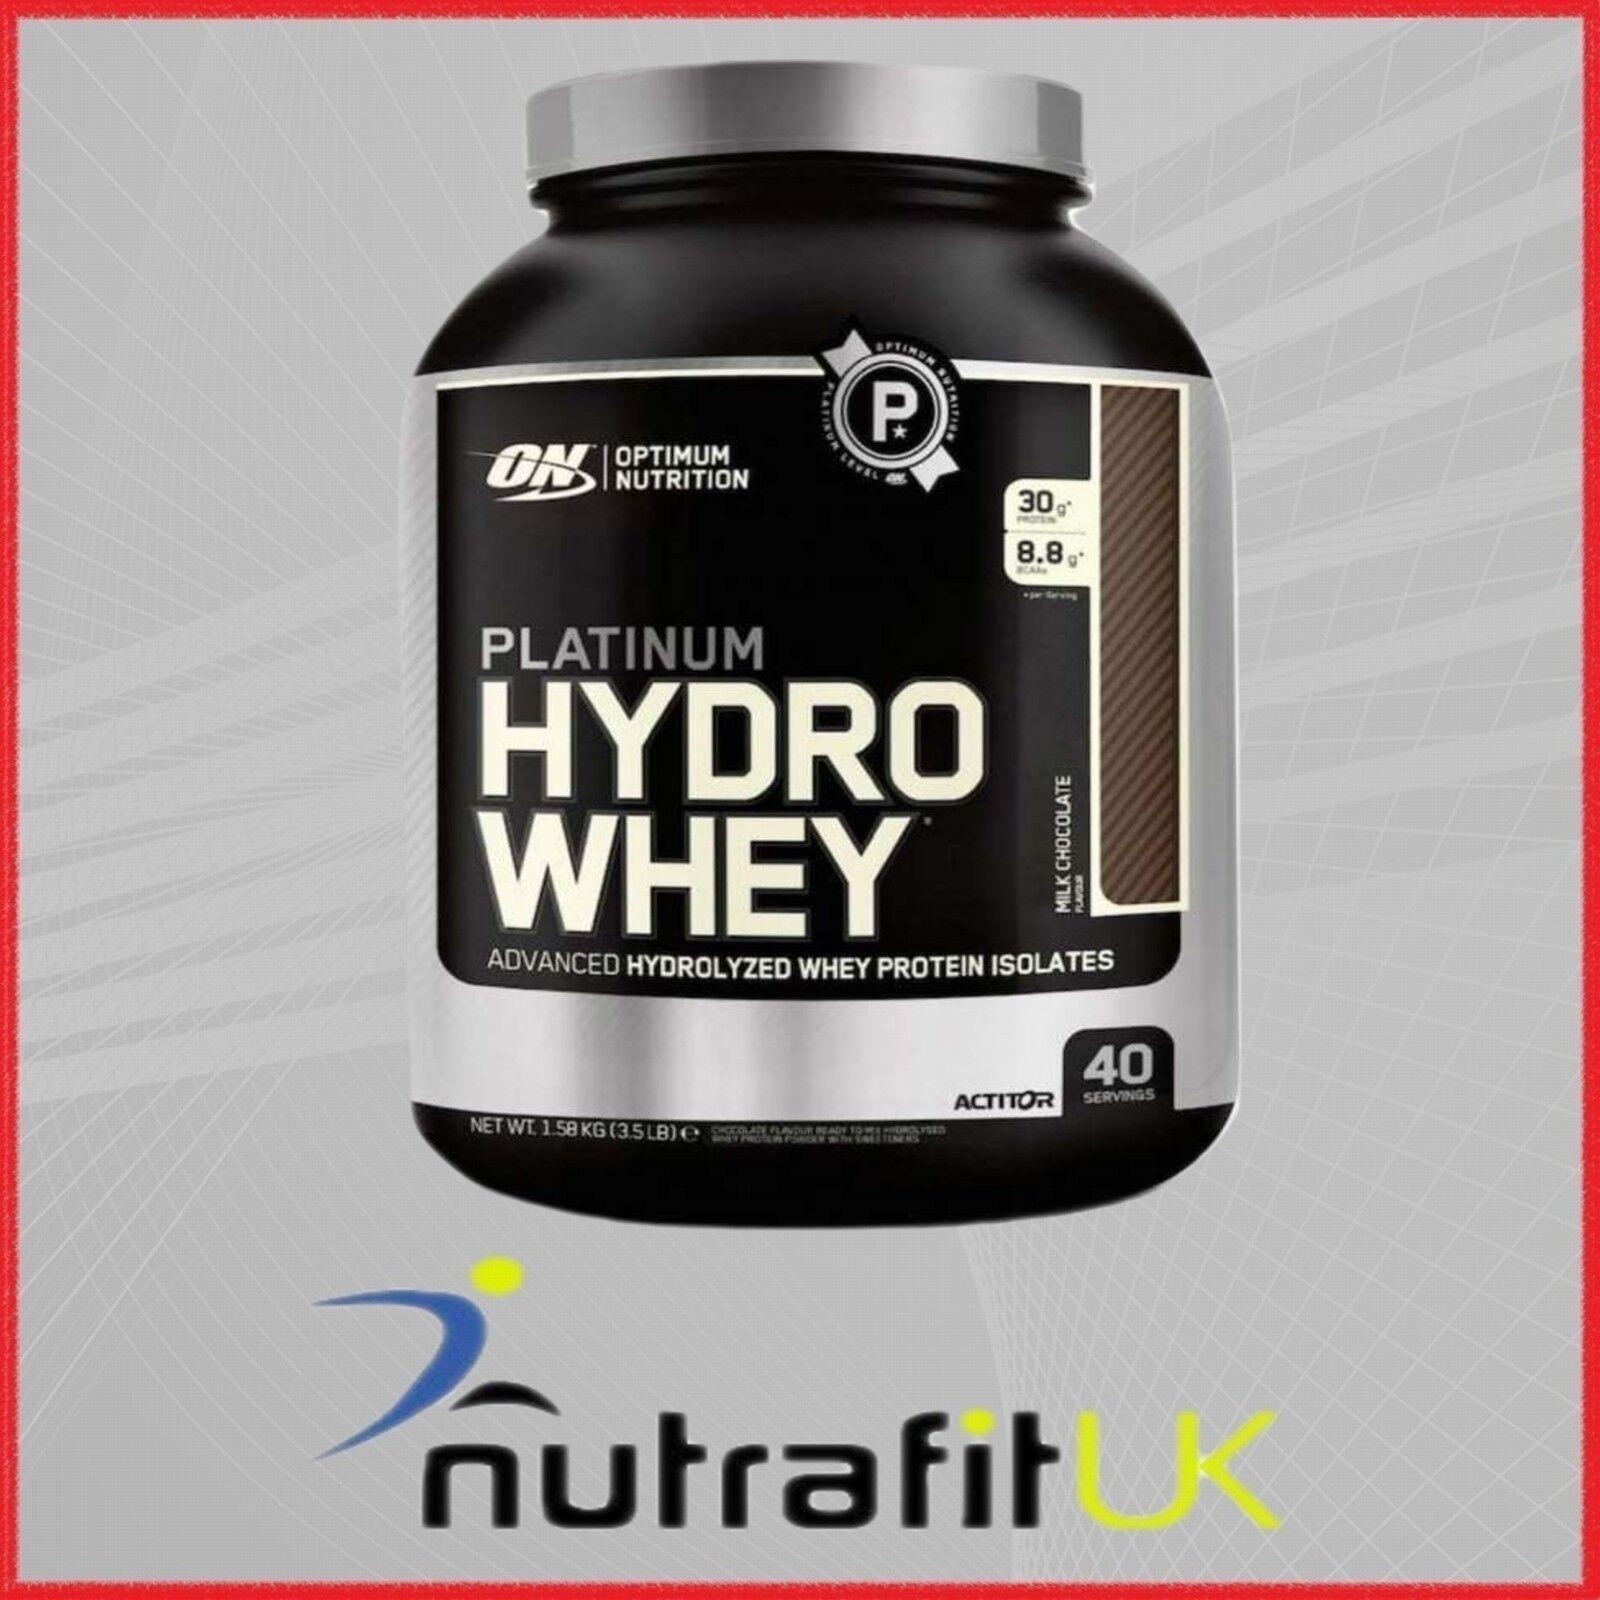 OPTIMUM NUTRITION protein PLATINUM HYDRO WHEY protein NUTRITION isolate powder 7d1e24